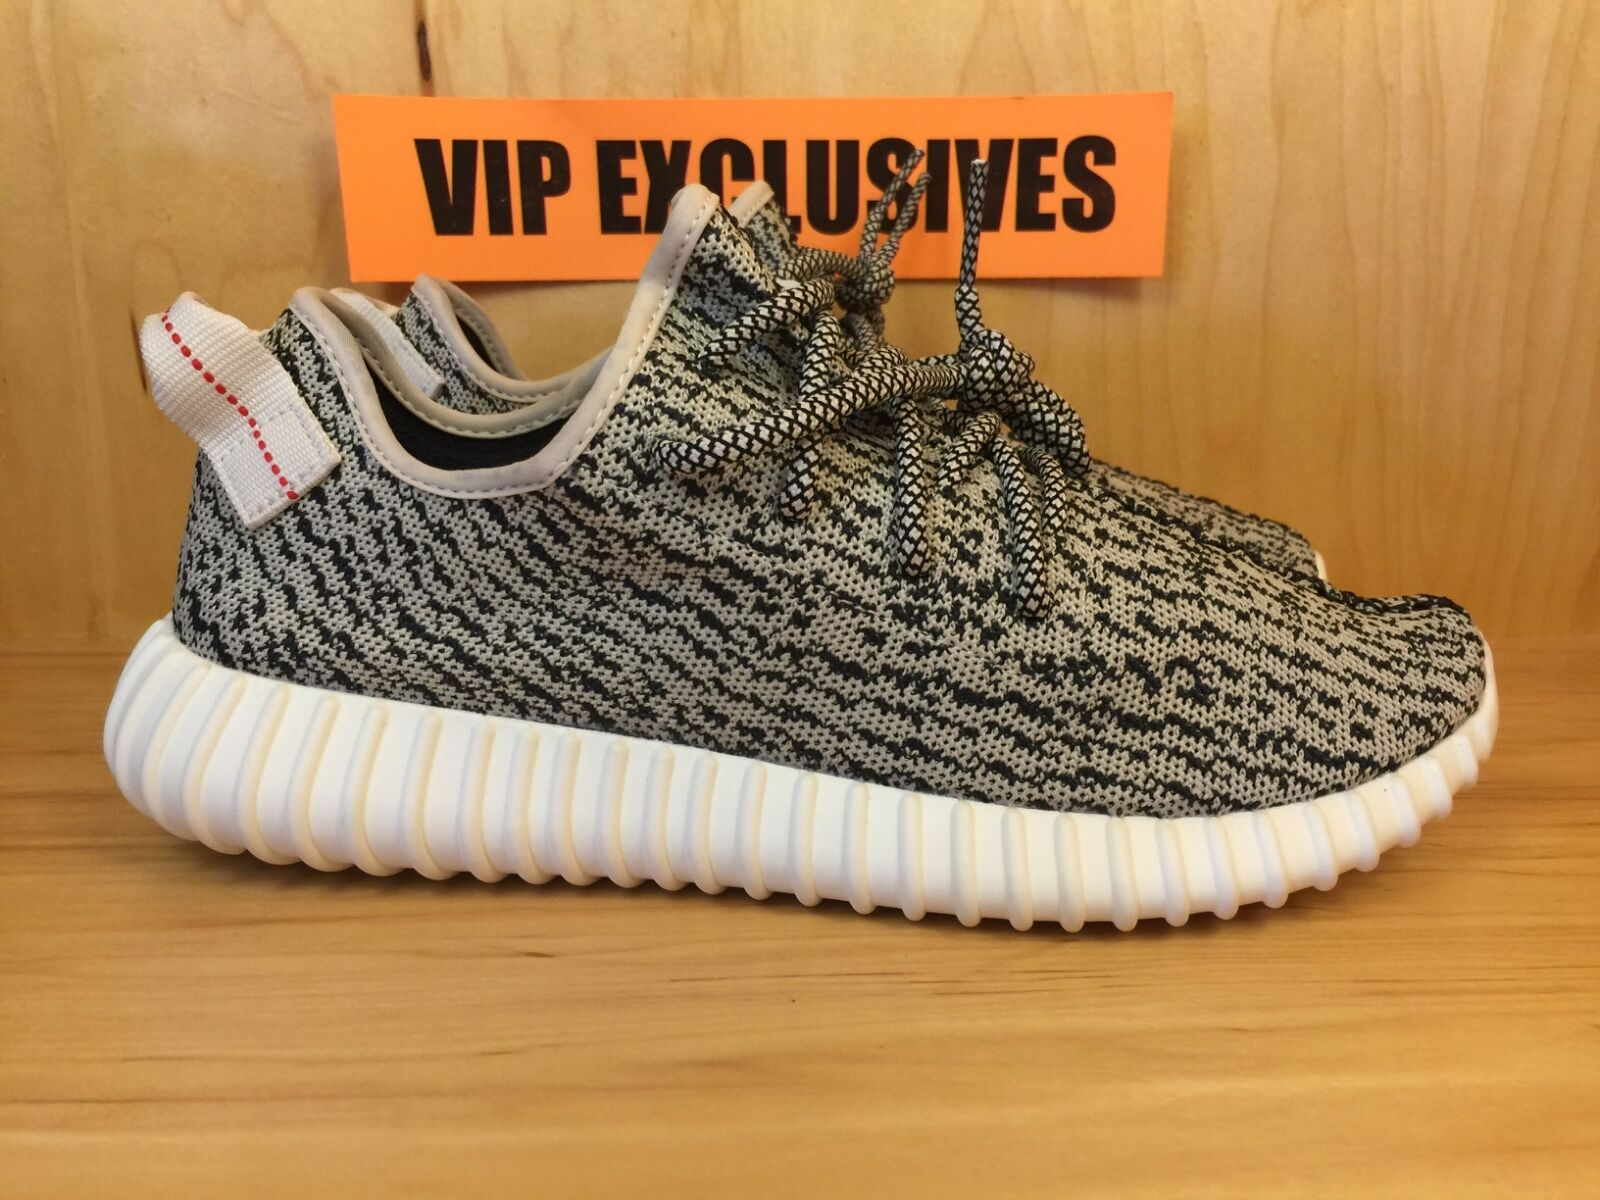 Adidas Yeezy 350 Boost Low Kanye West Turtle Dove bluee Grey White AQ4832